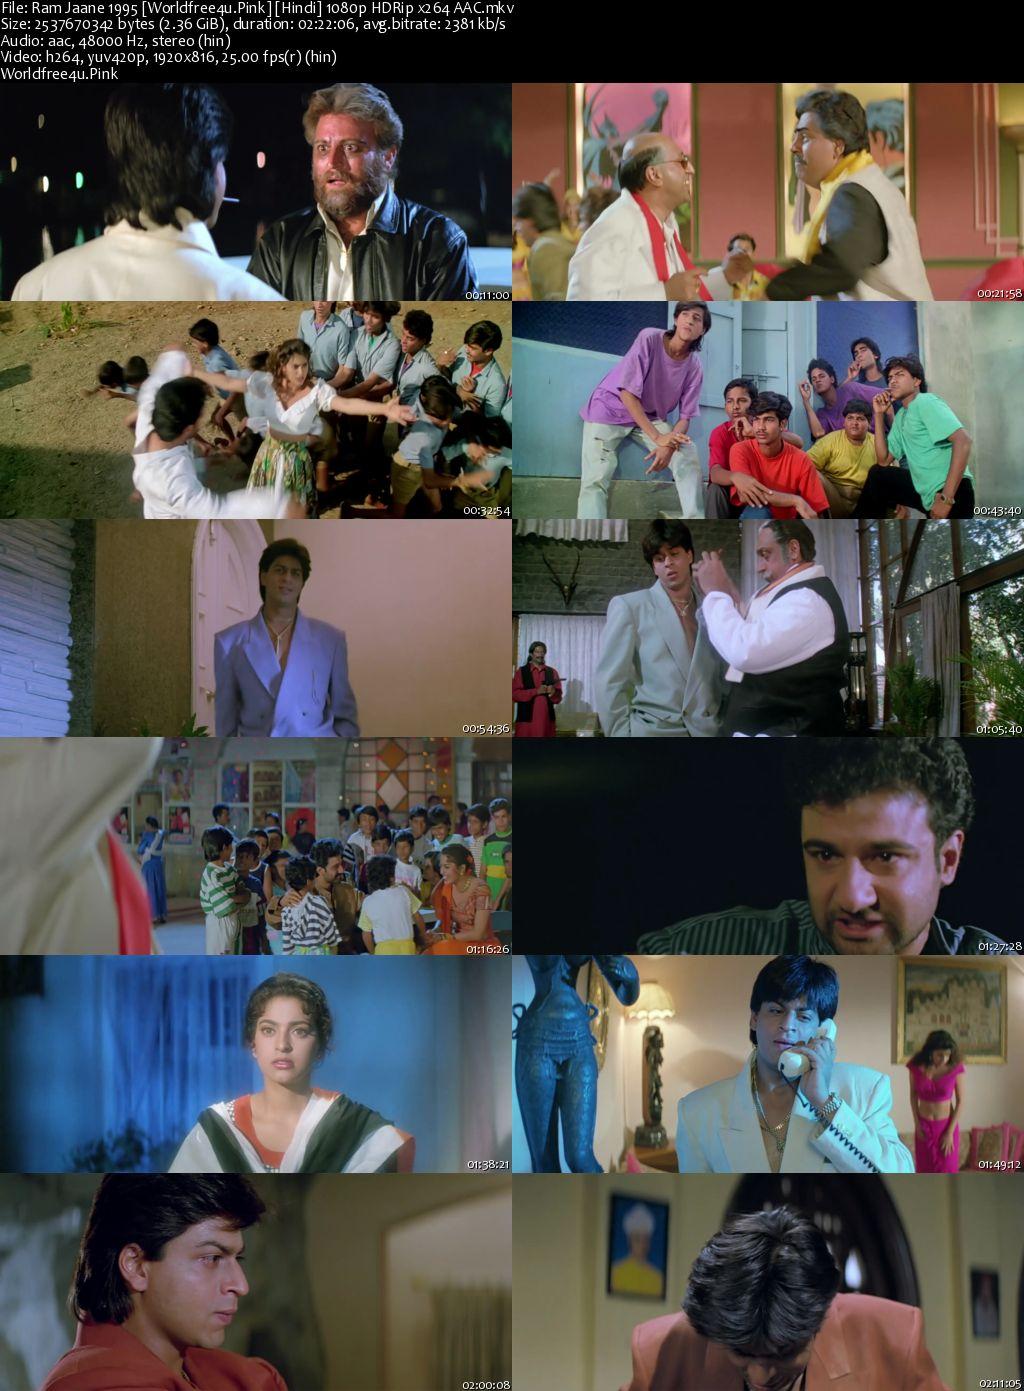 Ram Jaane 1995 Hindi HDRip 1080p